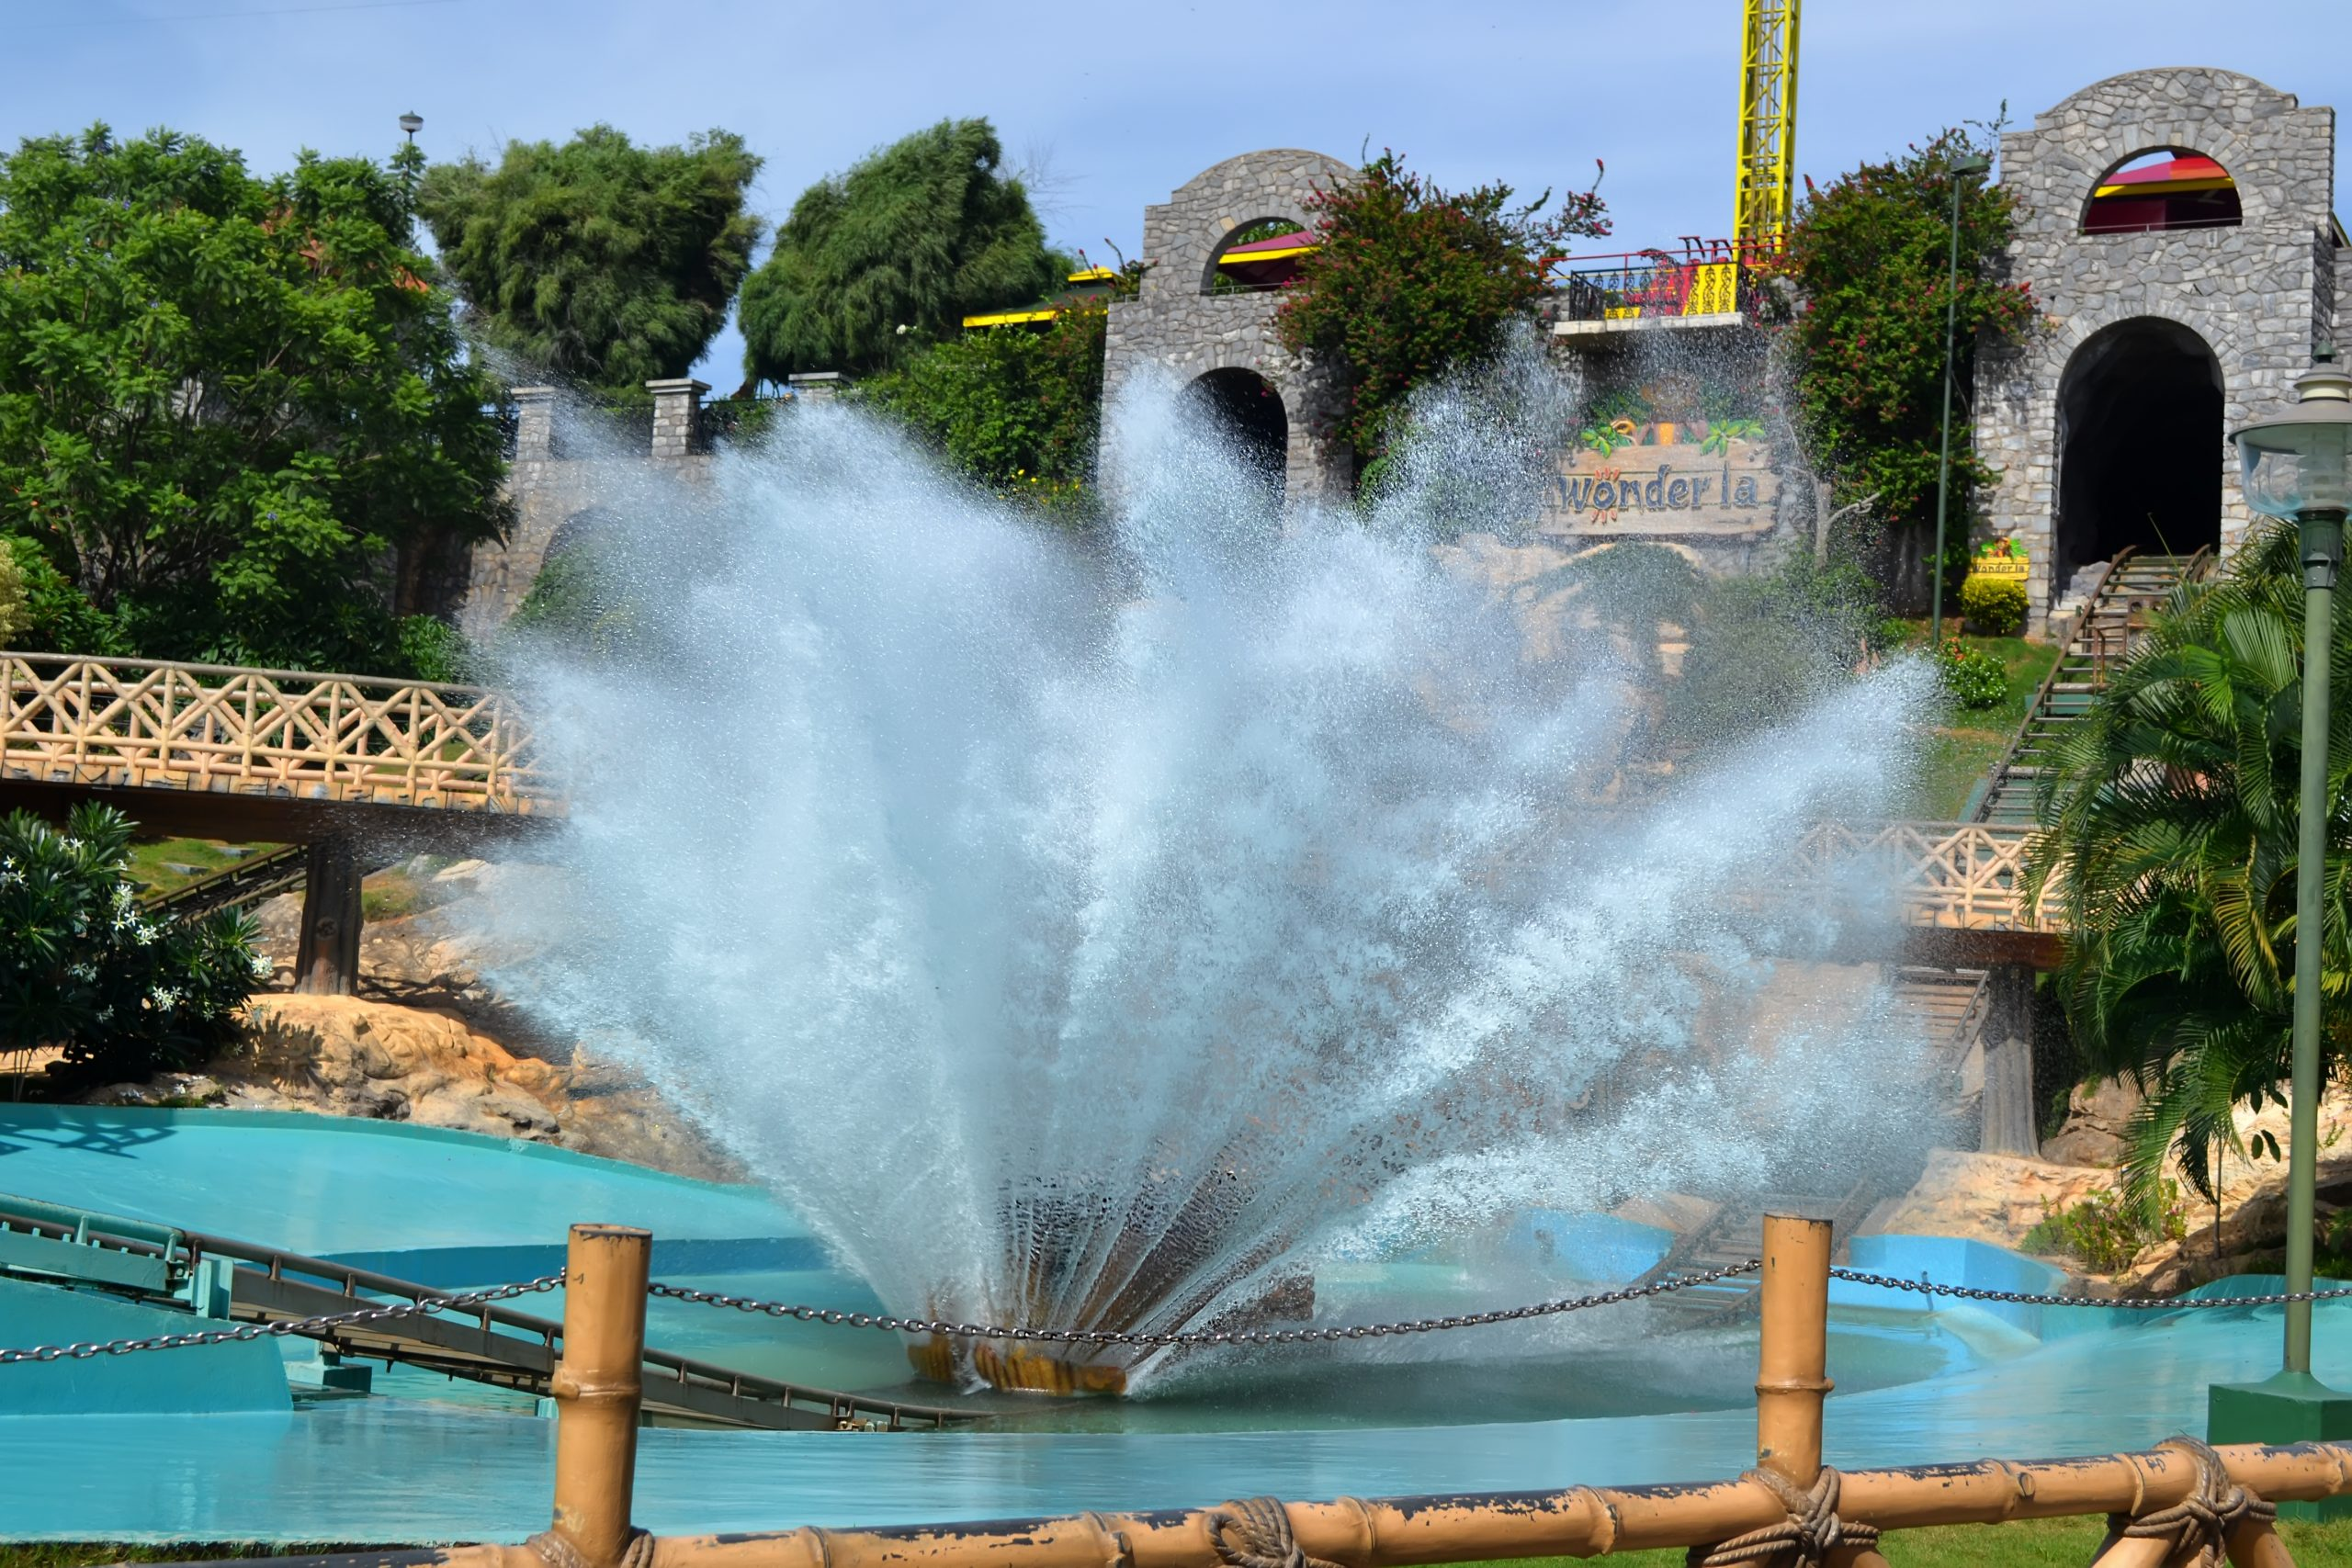 A fountain in Wonderla National Park